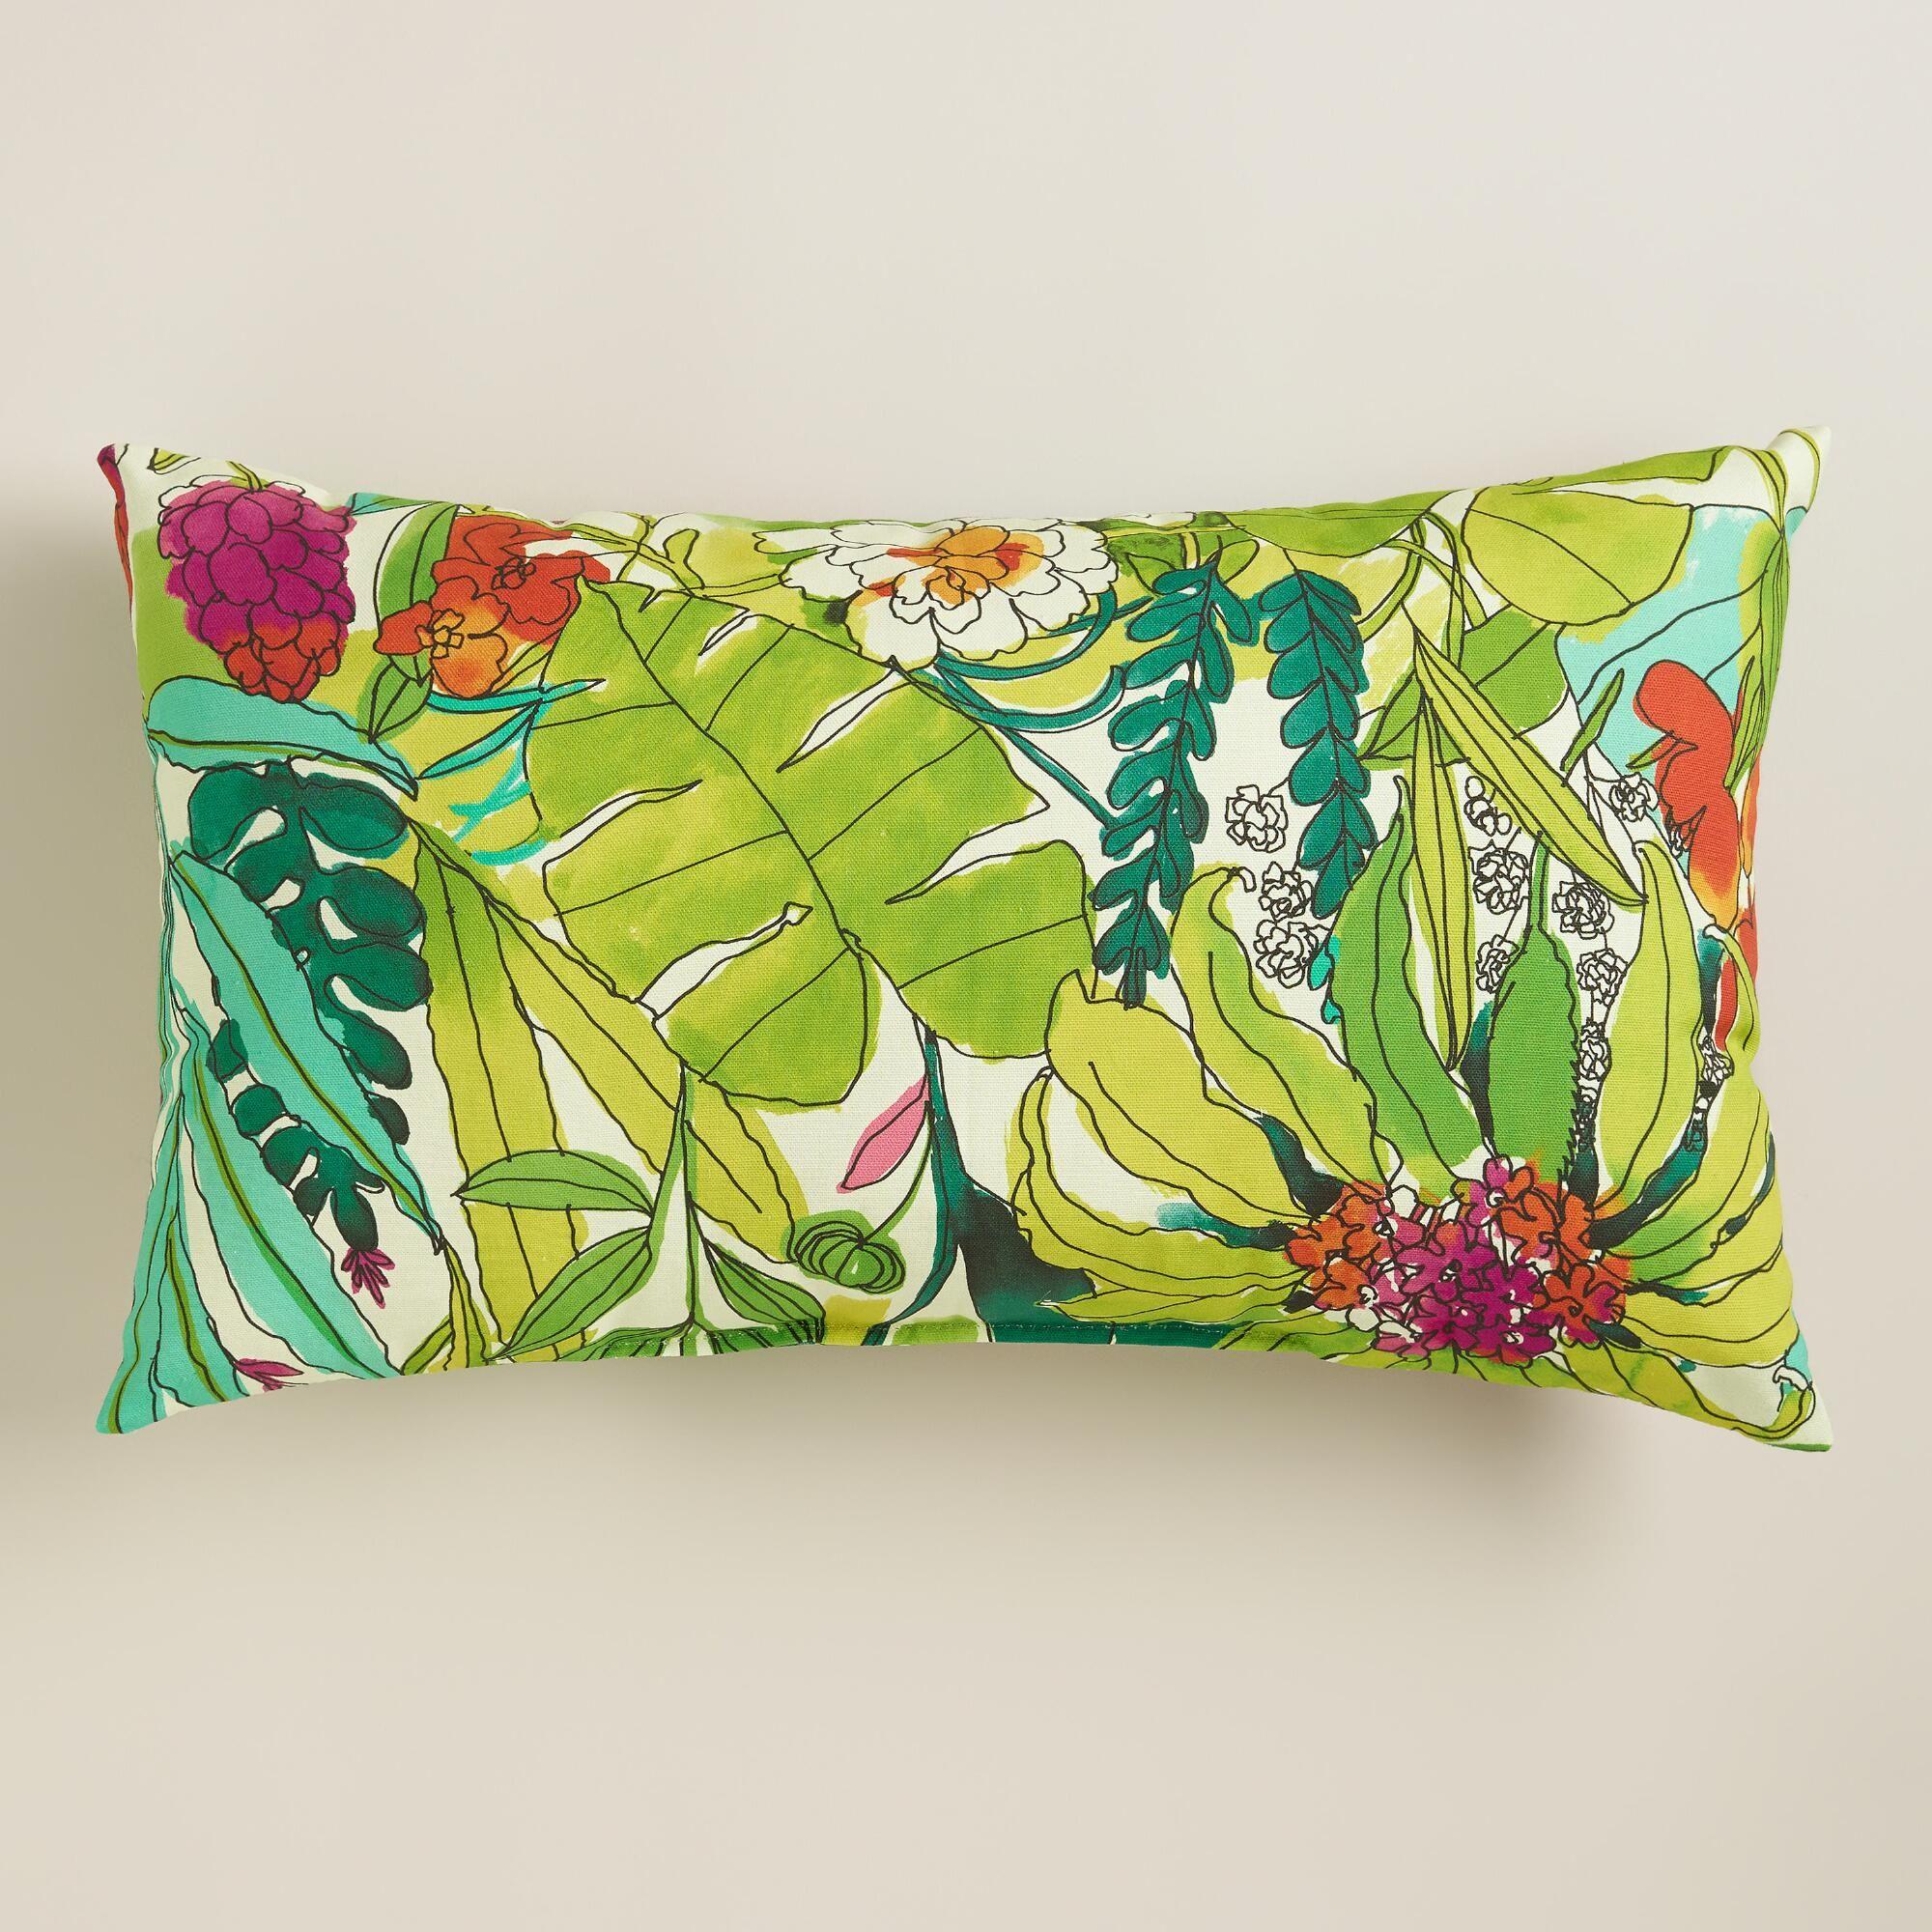 furniture patio outdoor com domusworks lumbar orange teal chevron amazon pillow garden dp pillows